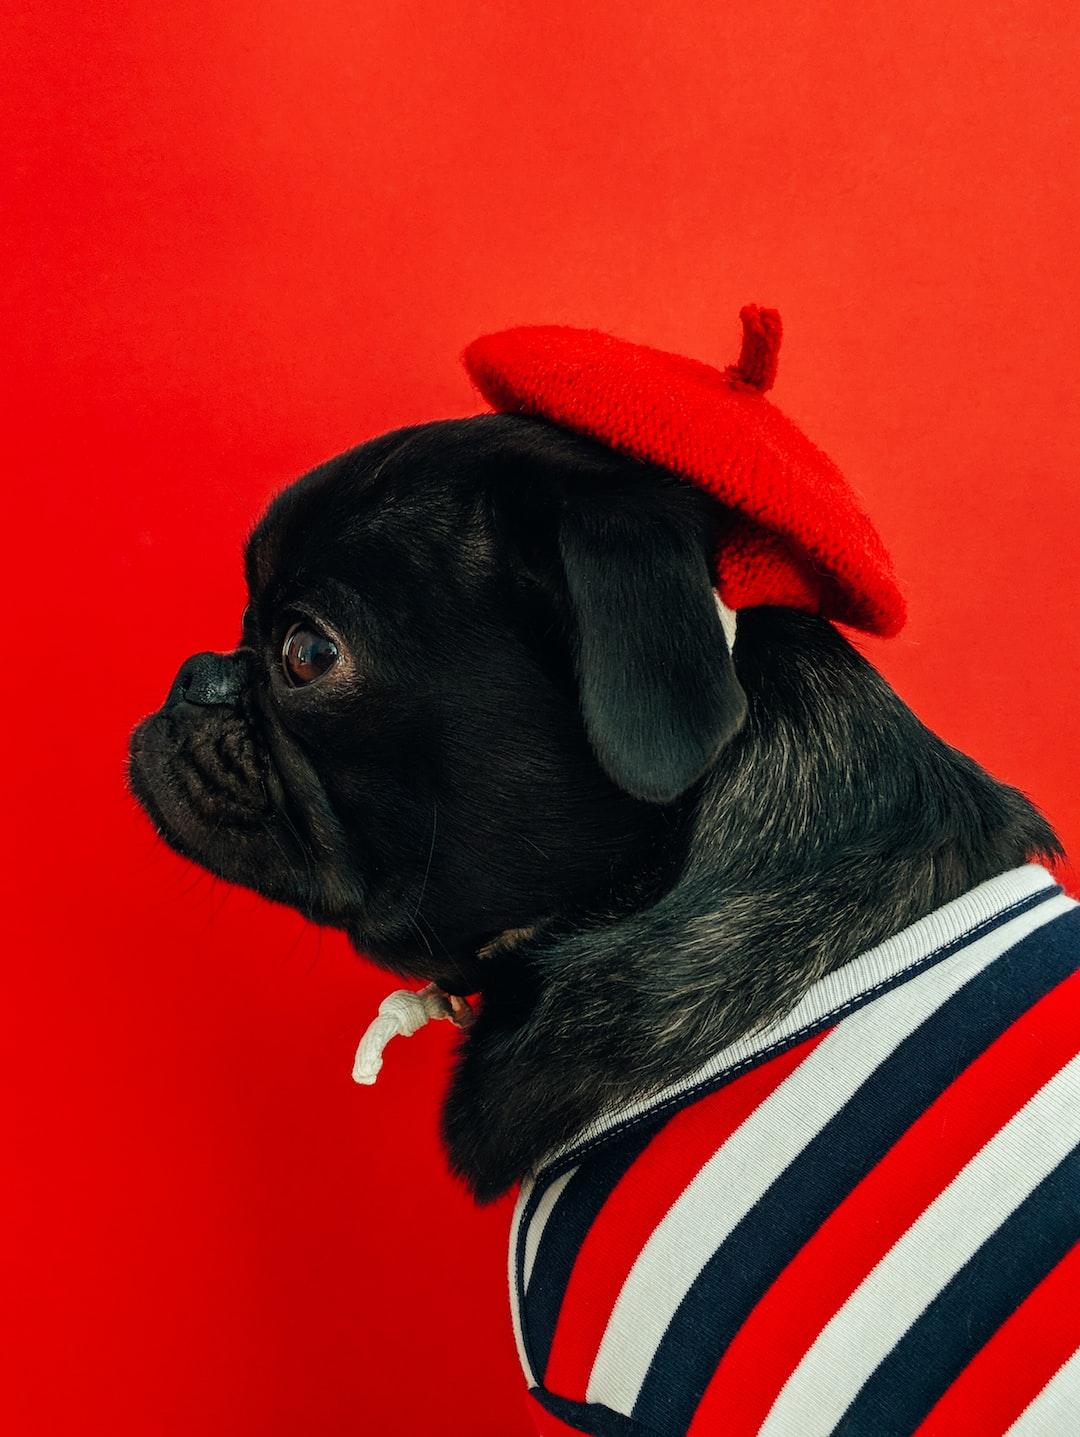 Toshi (https://www.instagram.com/toshi.dog/) wearing a beret.